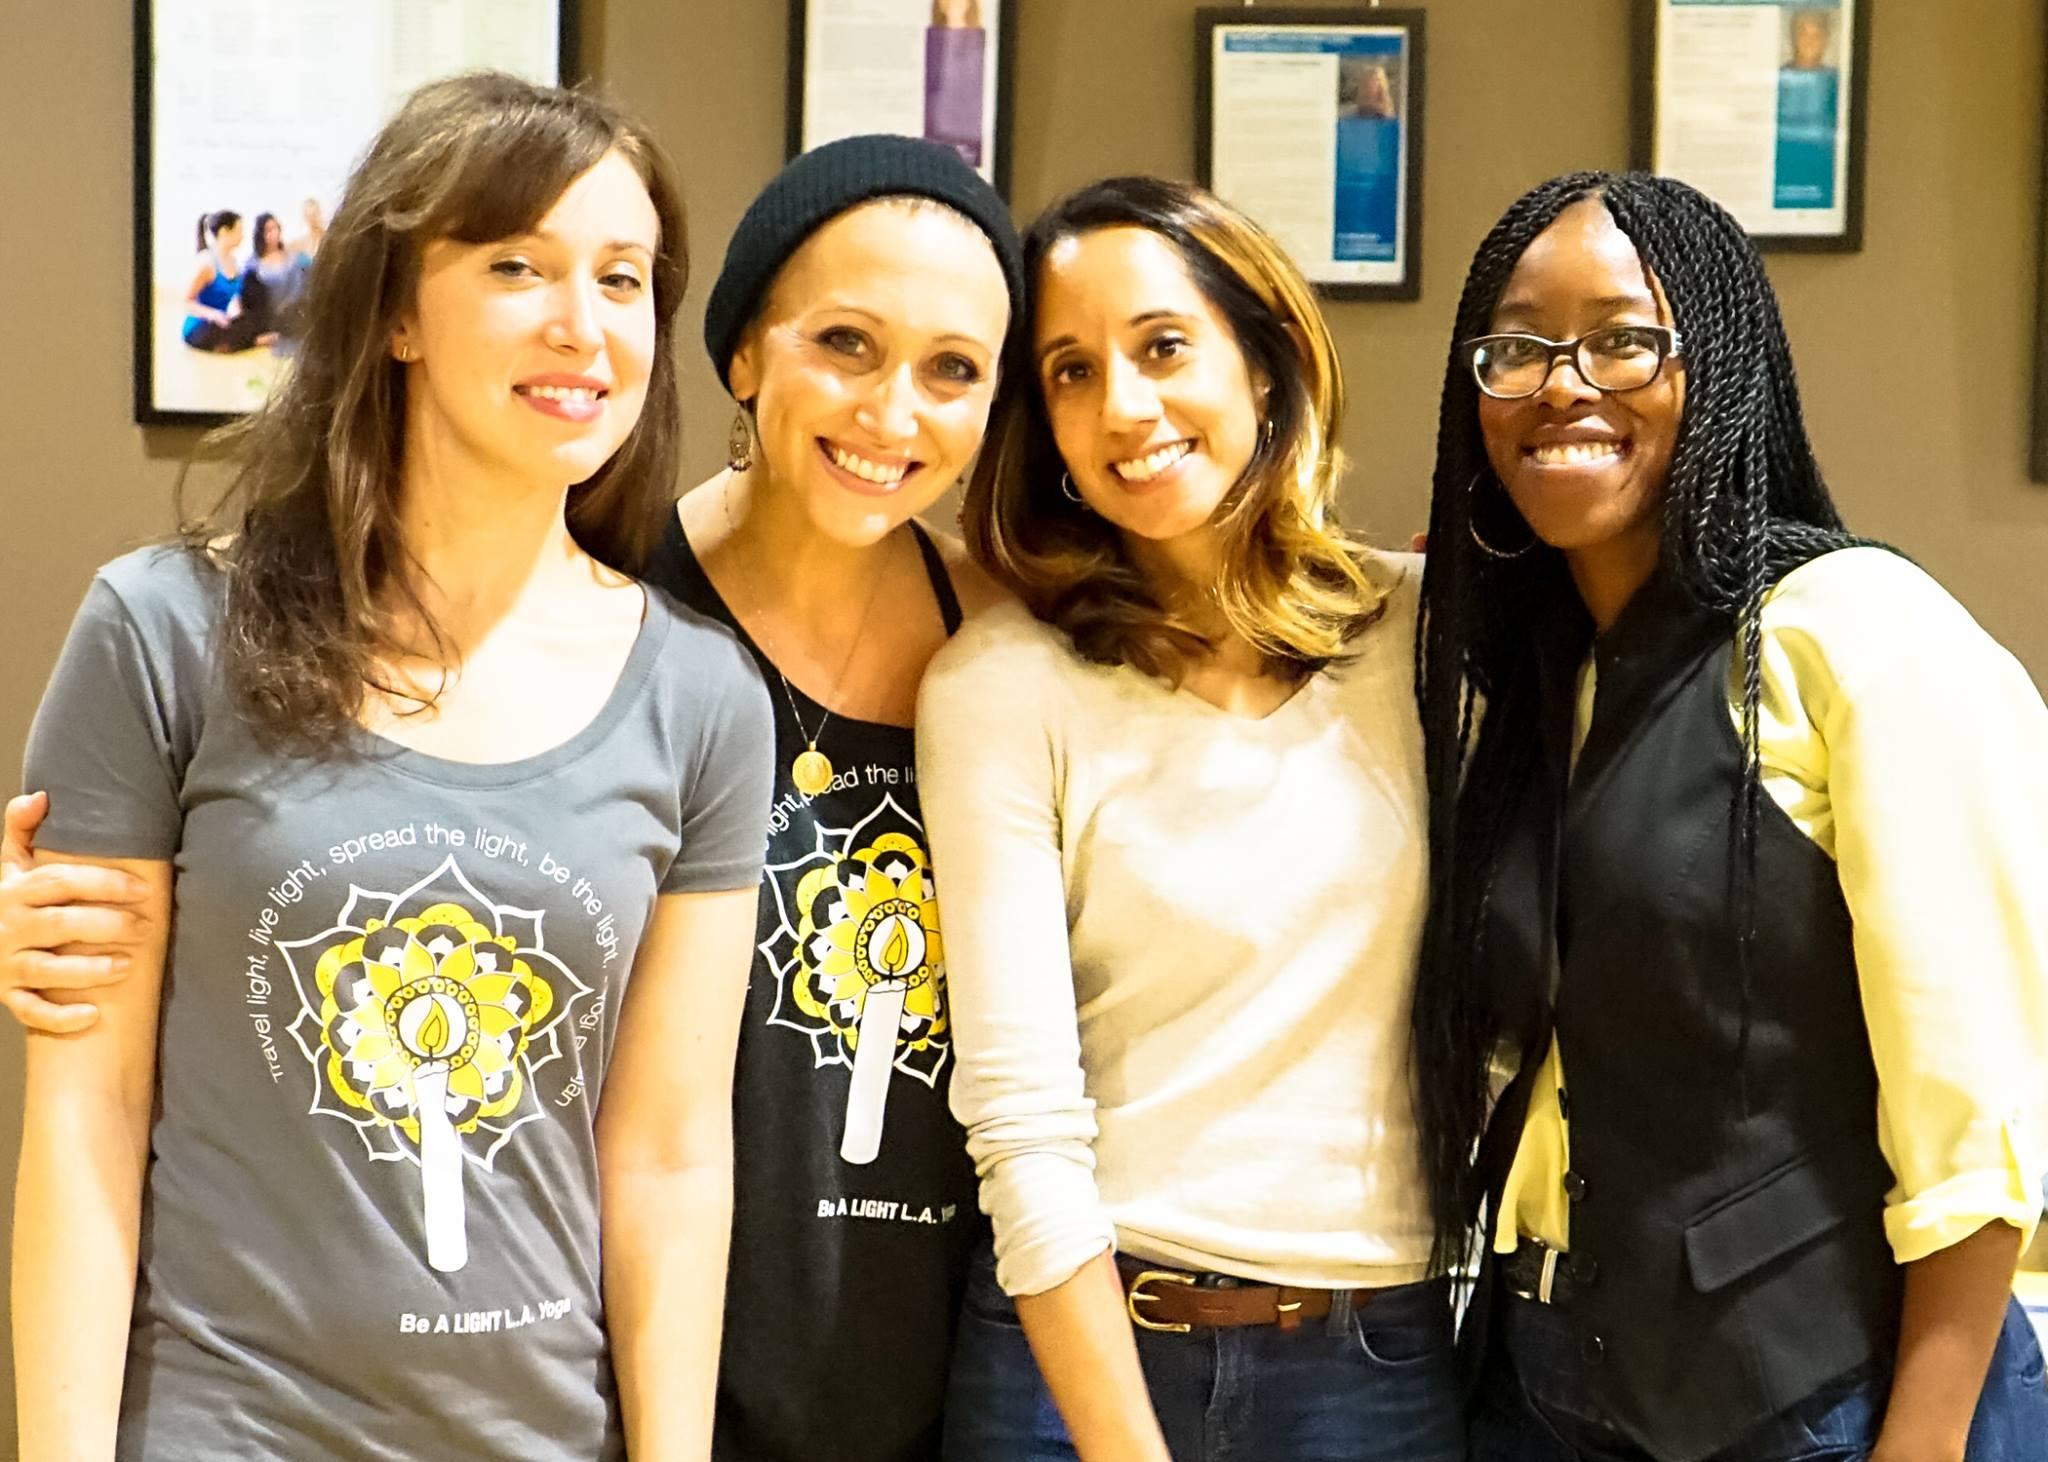 From left to right: Event O  rganizer Dania Alisa, YogaWorks Teacher Lainie Devina, Sat Naam Founder Seema Kapur, and Sat Naam Program Director Cecilia Ussher.